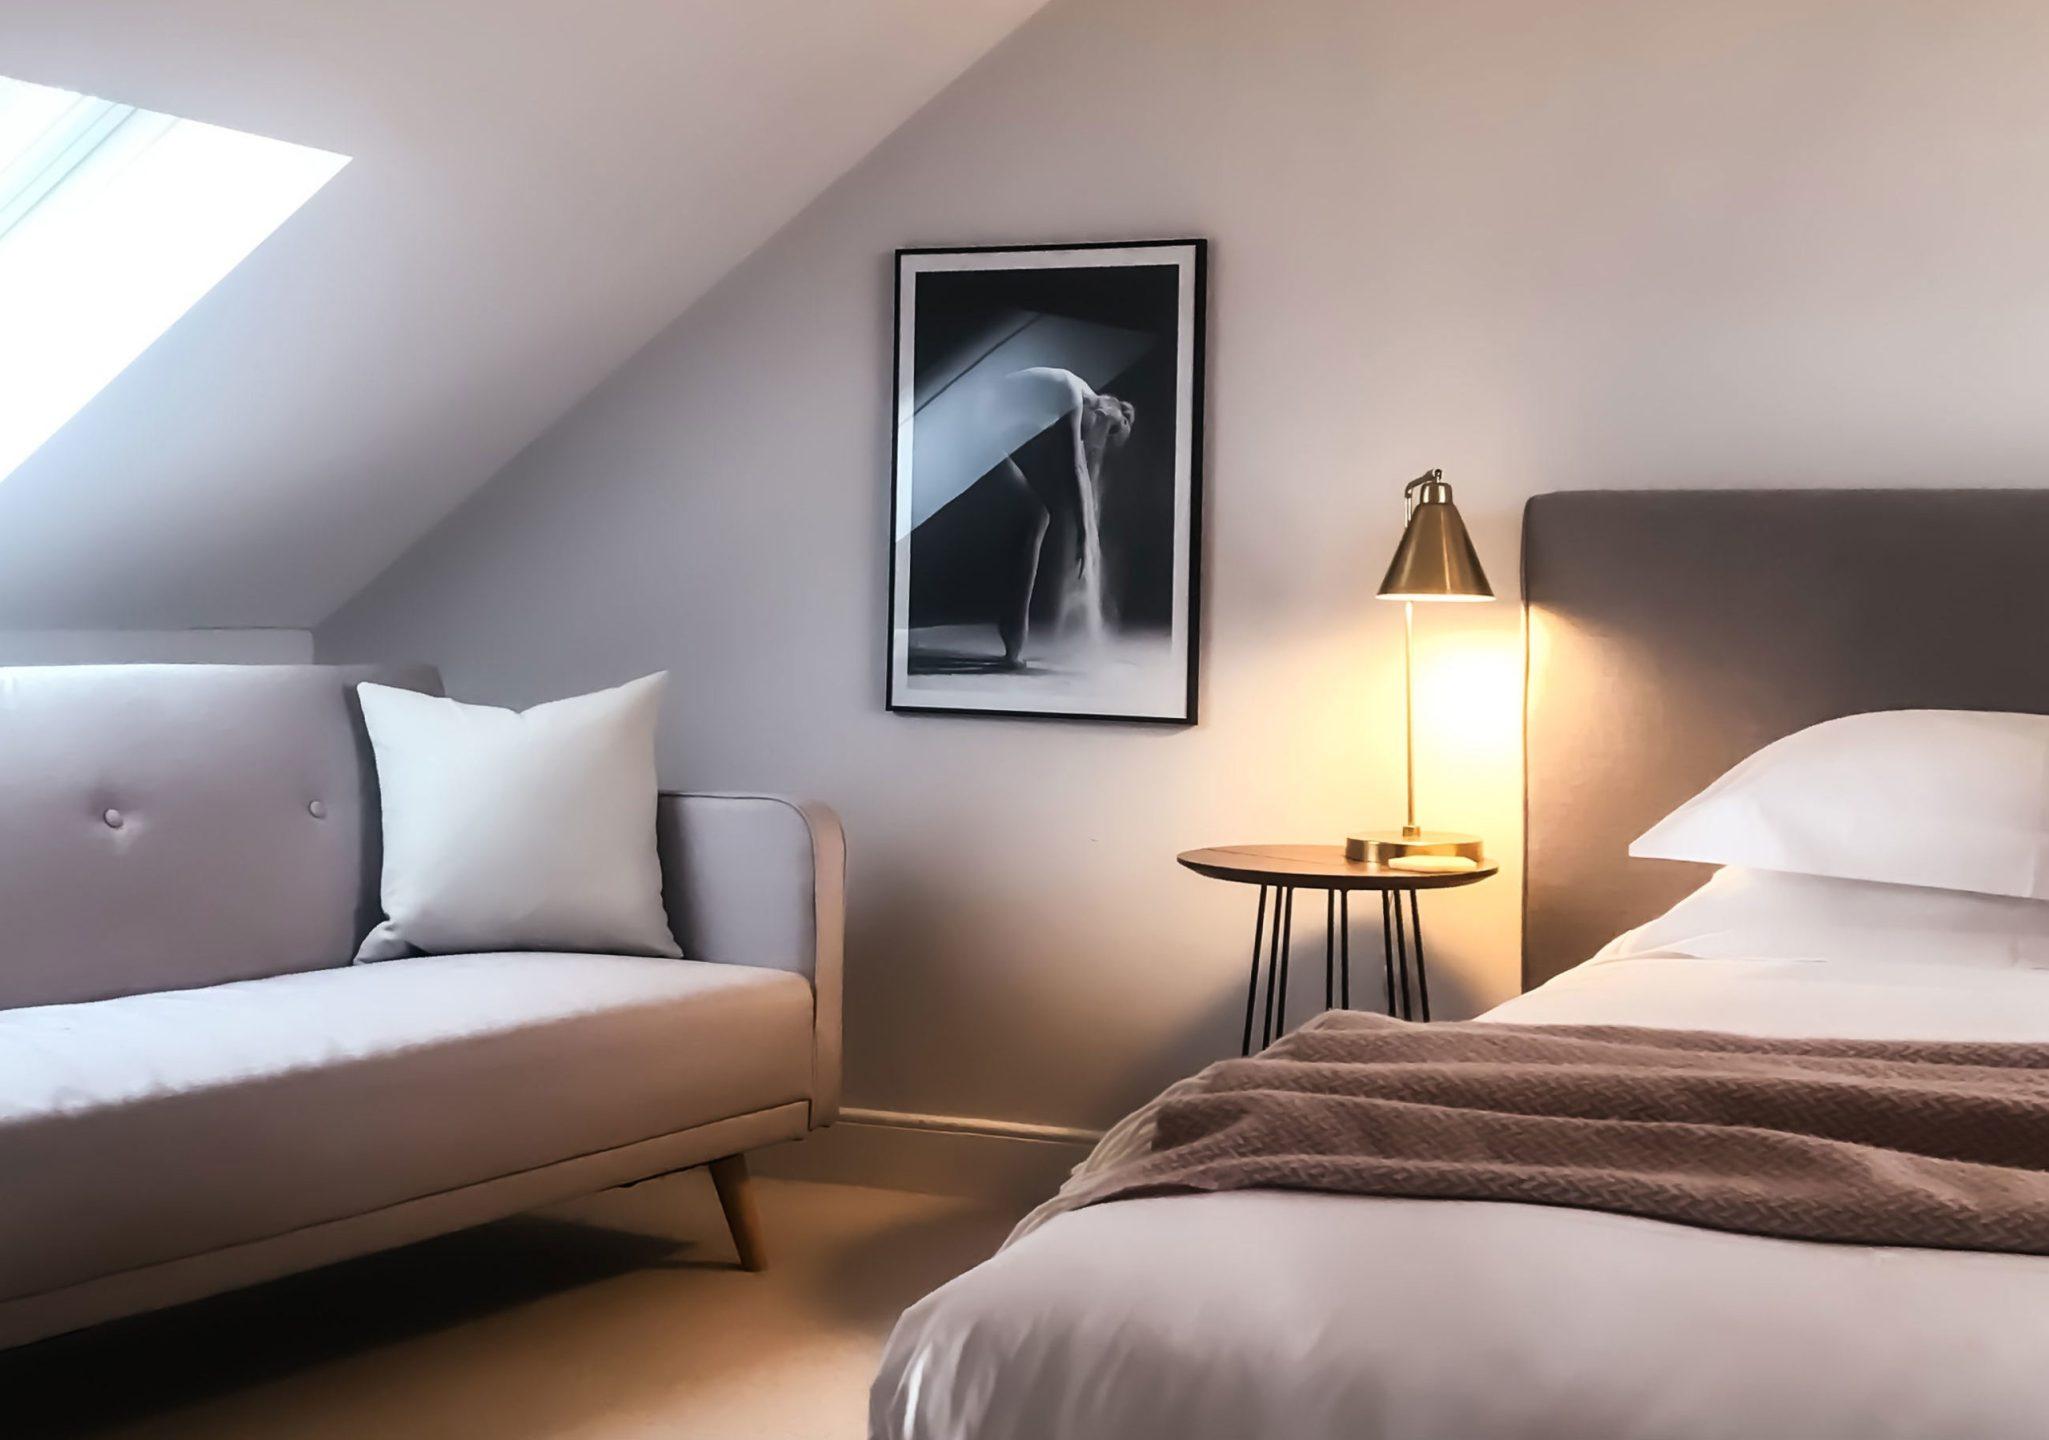 bedroom in converted loft space